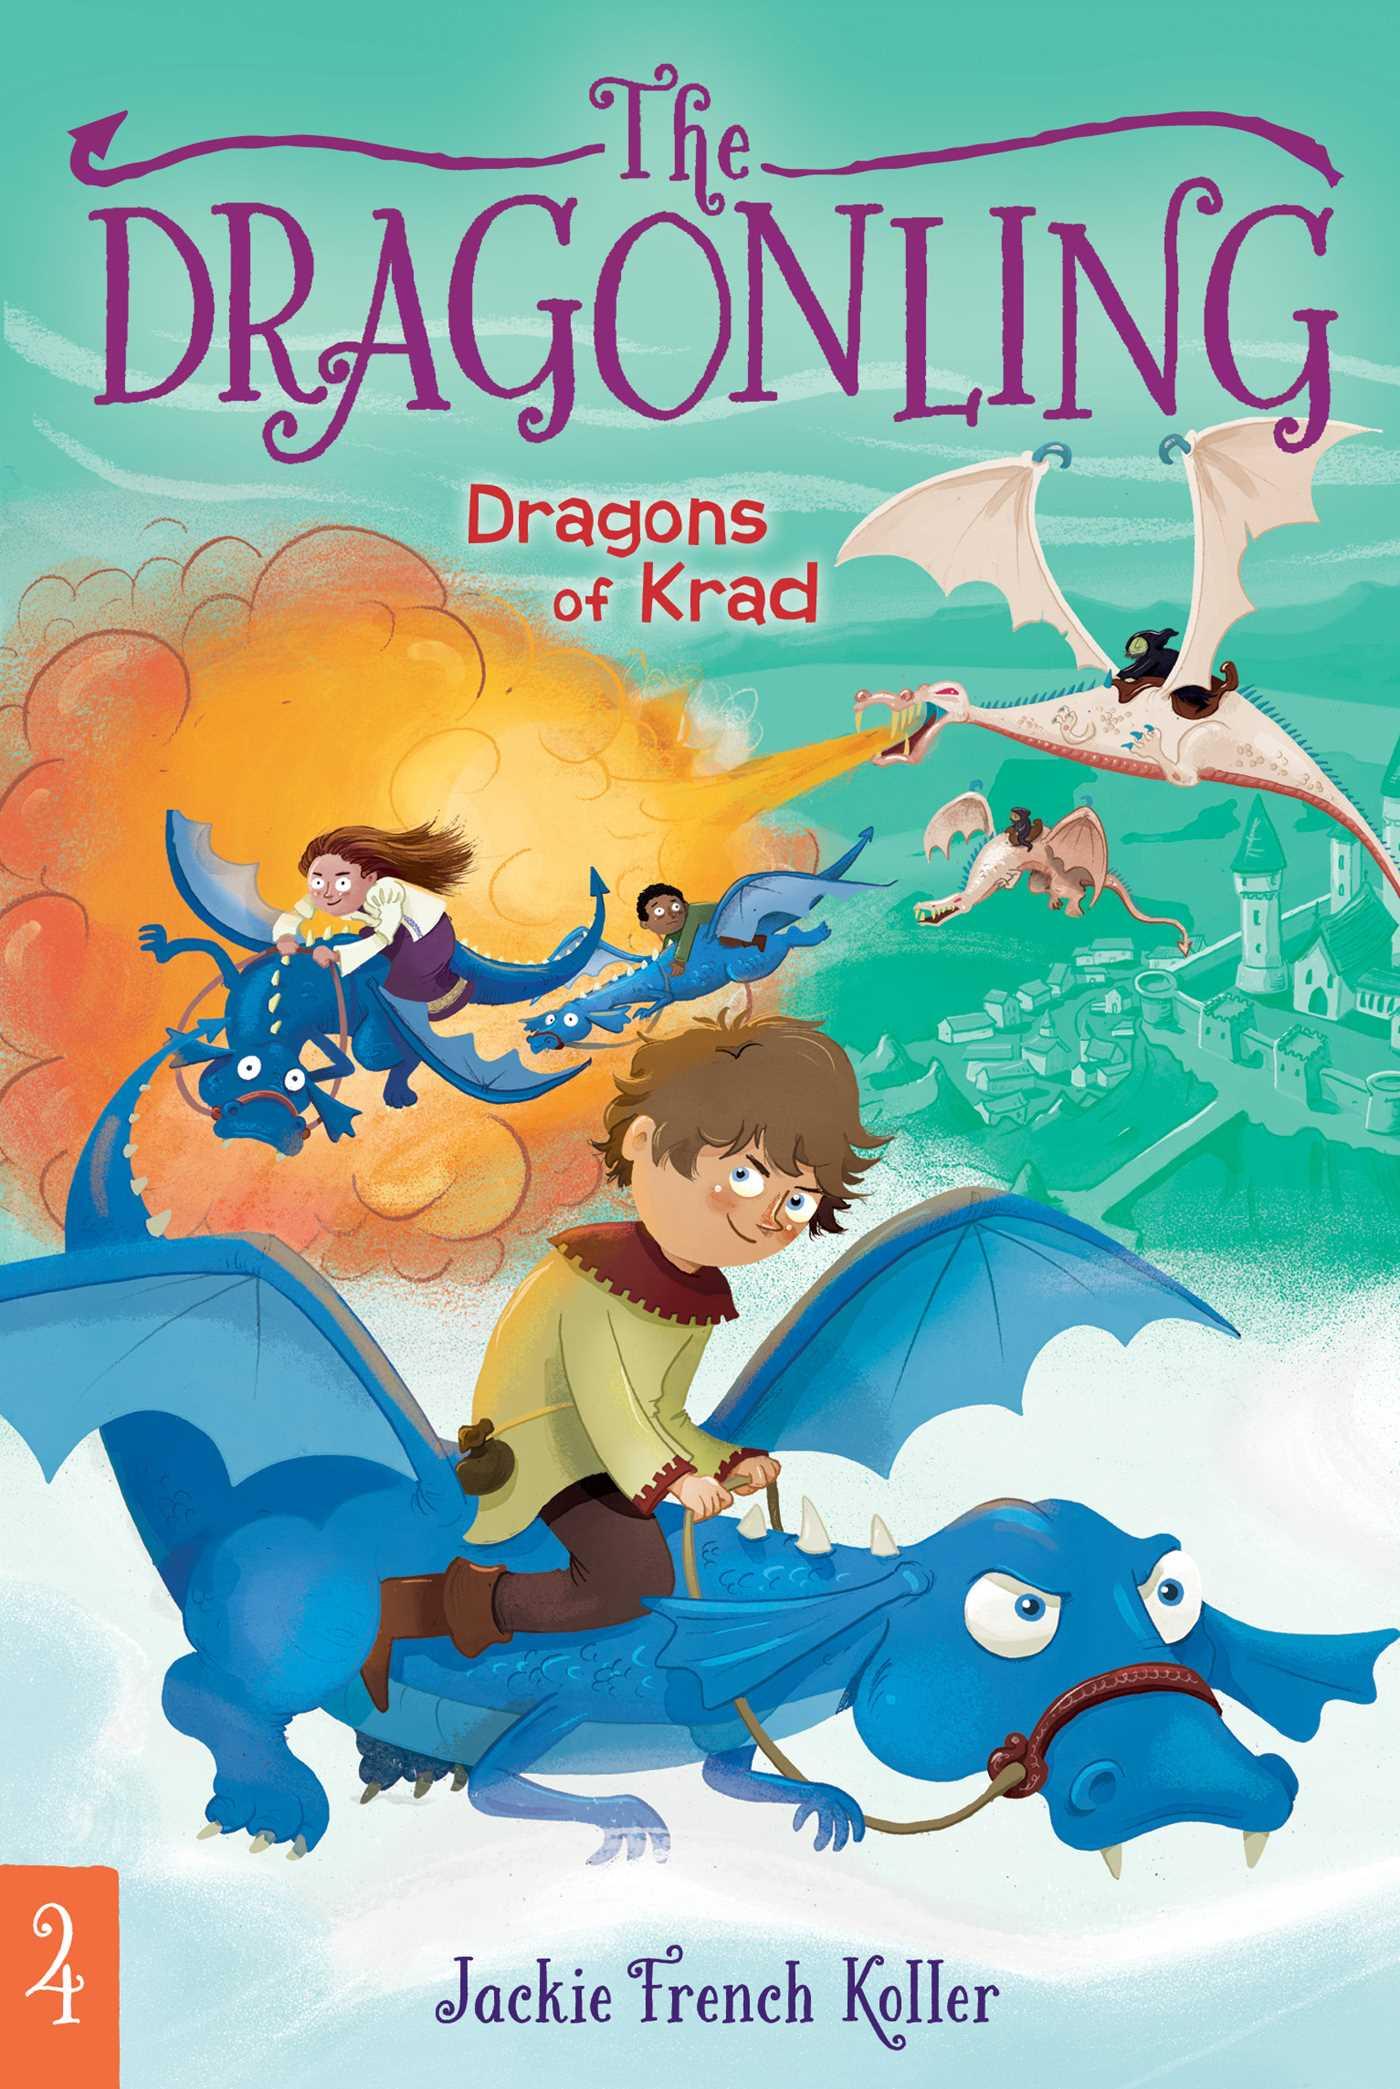 Dragons of krad 9781534400702 hr